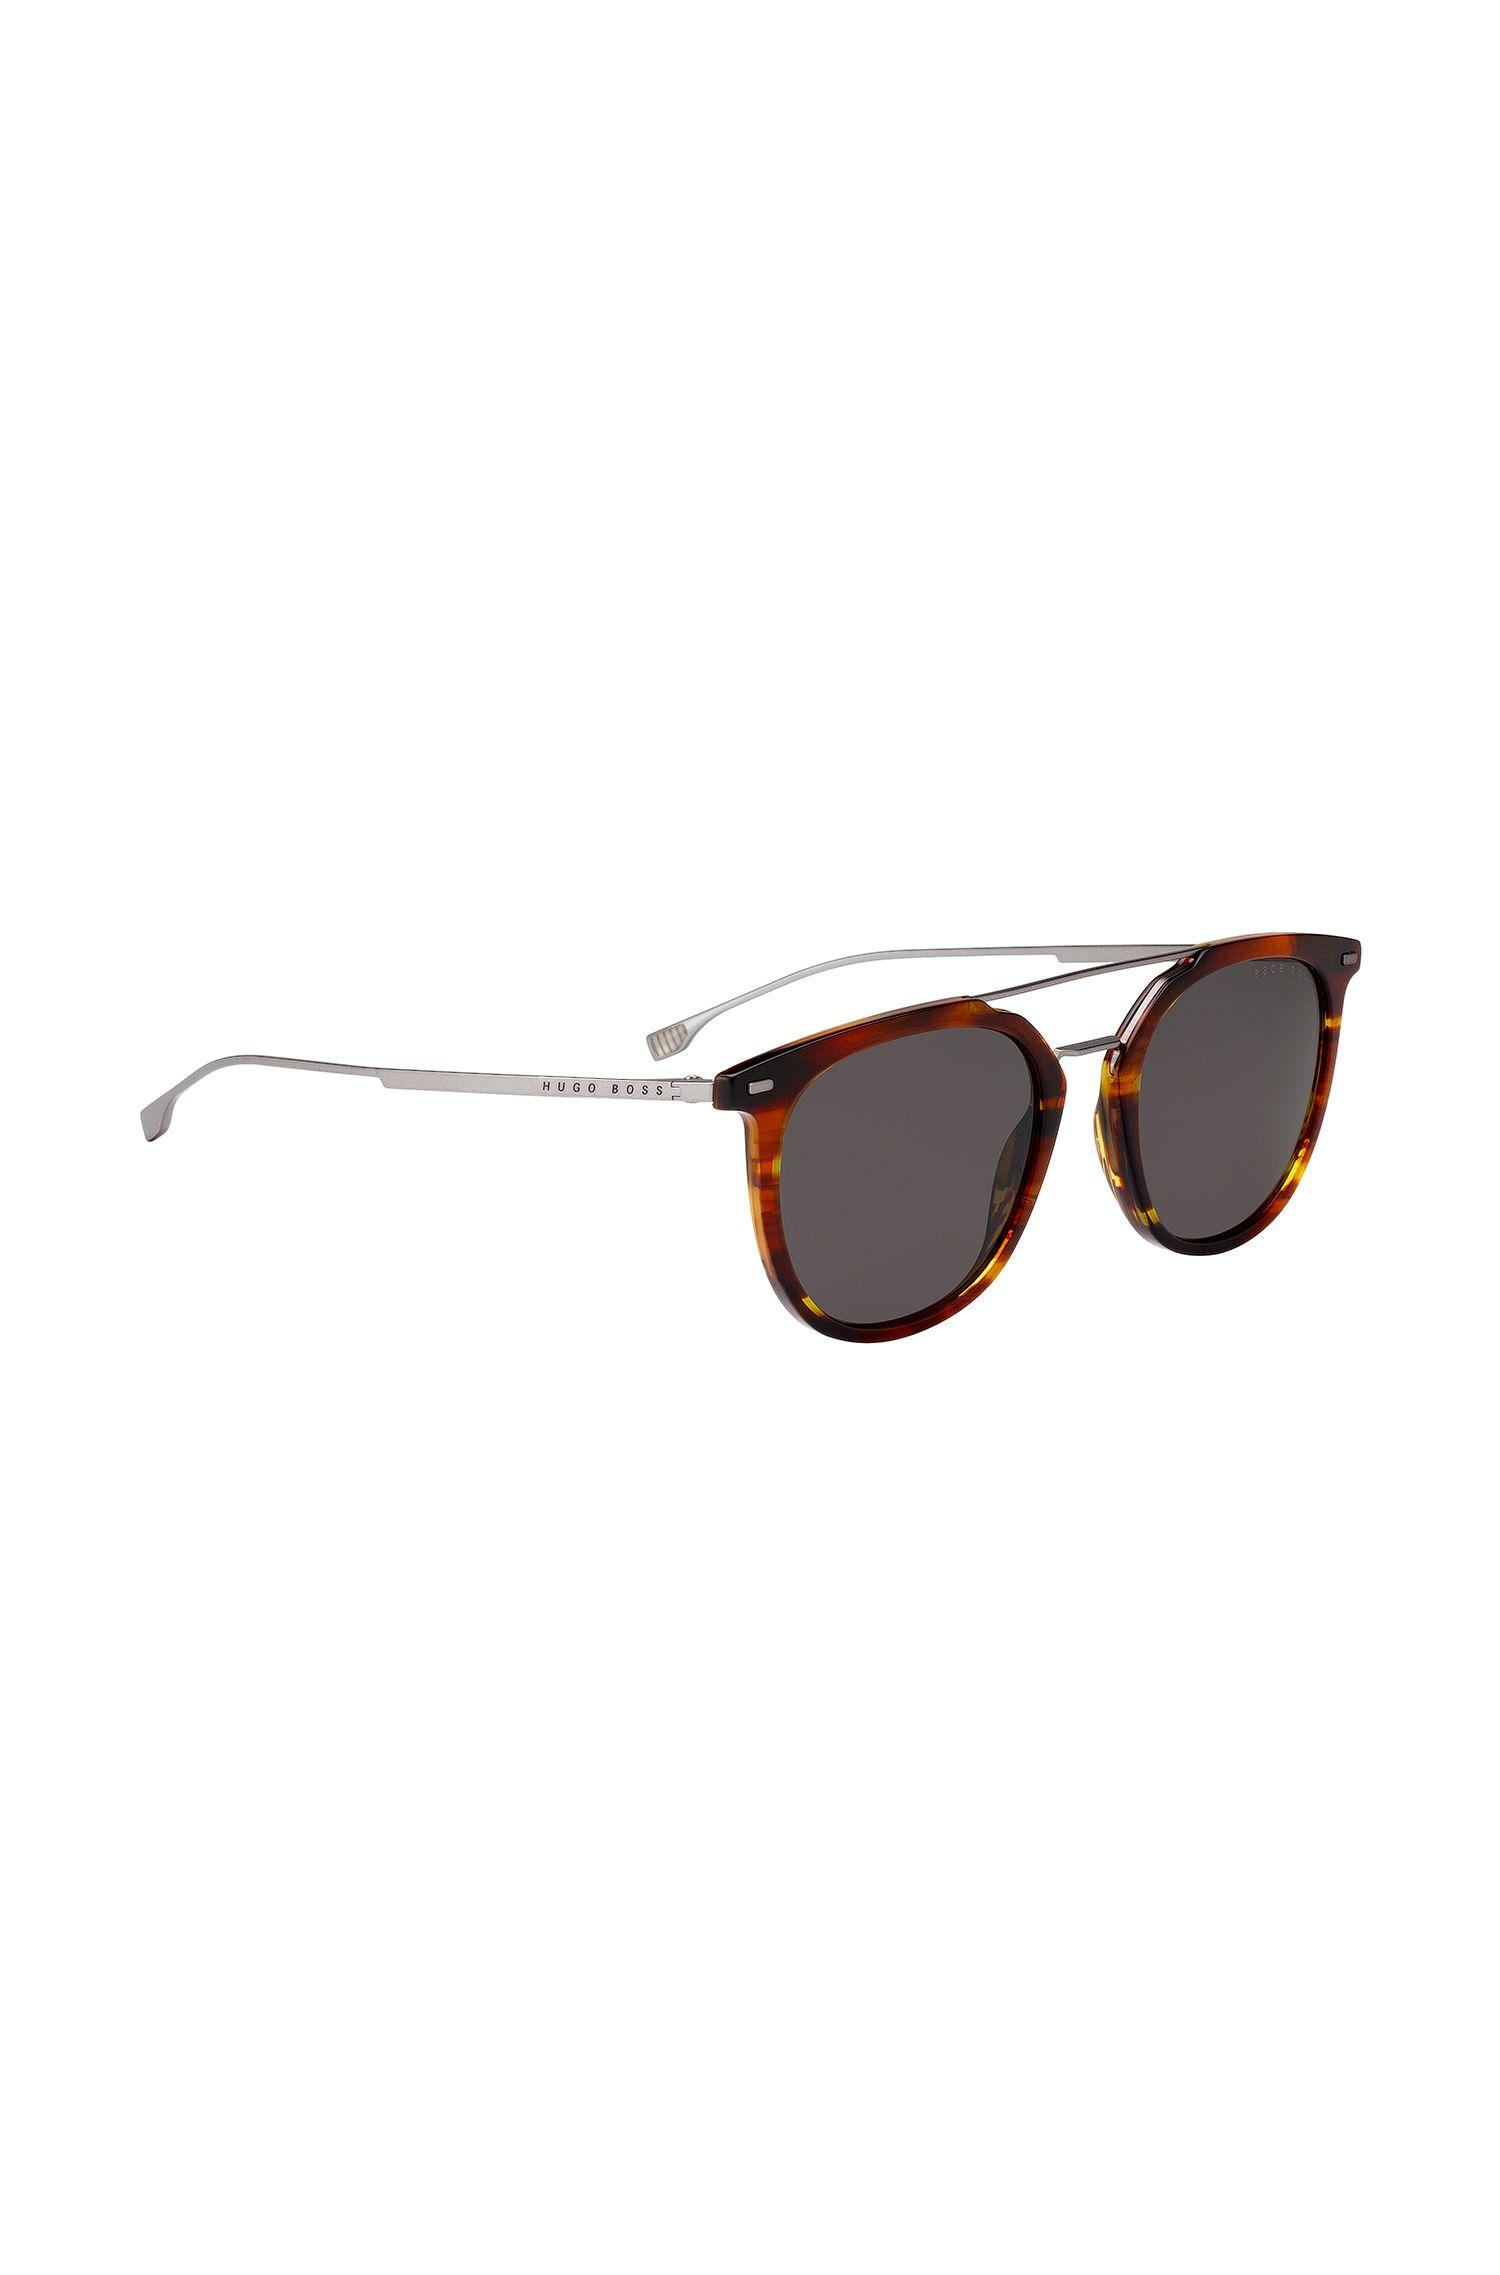 Double-bridge sunglasses with Havana frames, Assorted-Pre-Pack